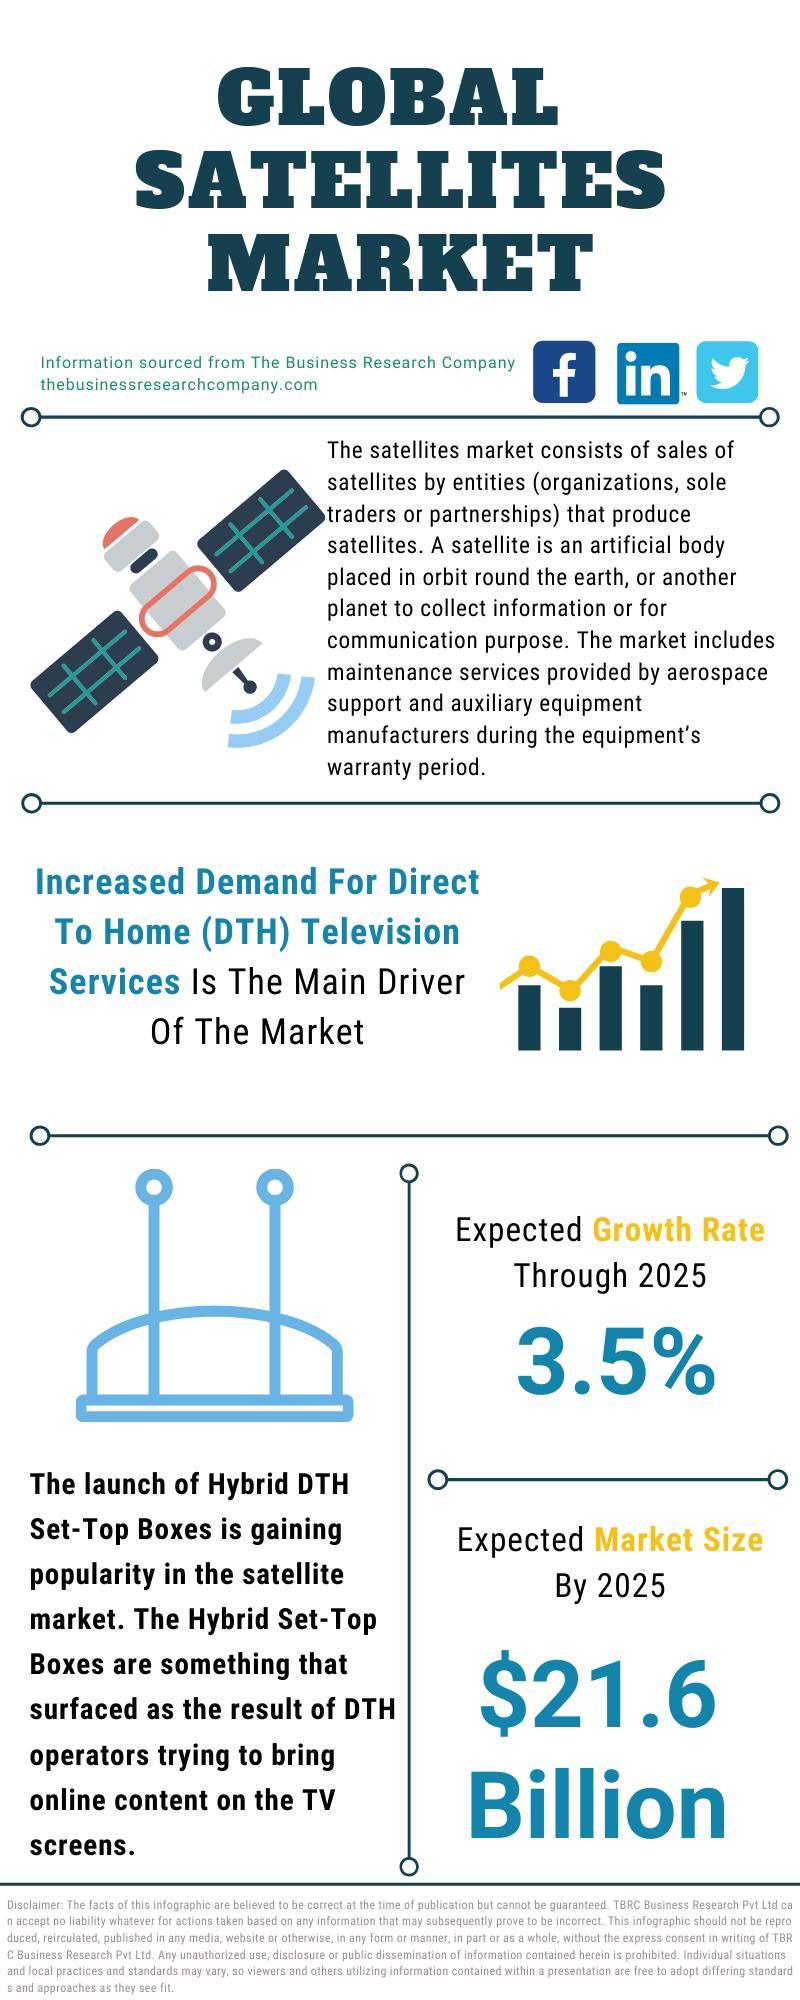 Satellites Market Growth